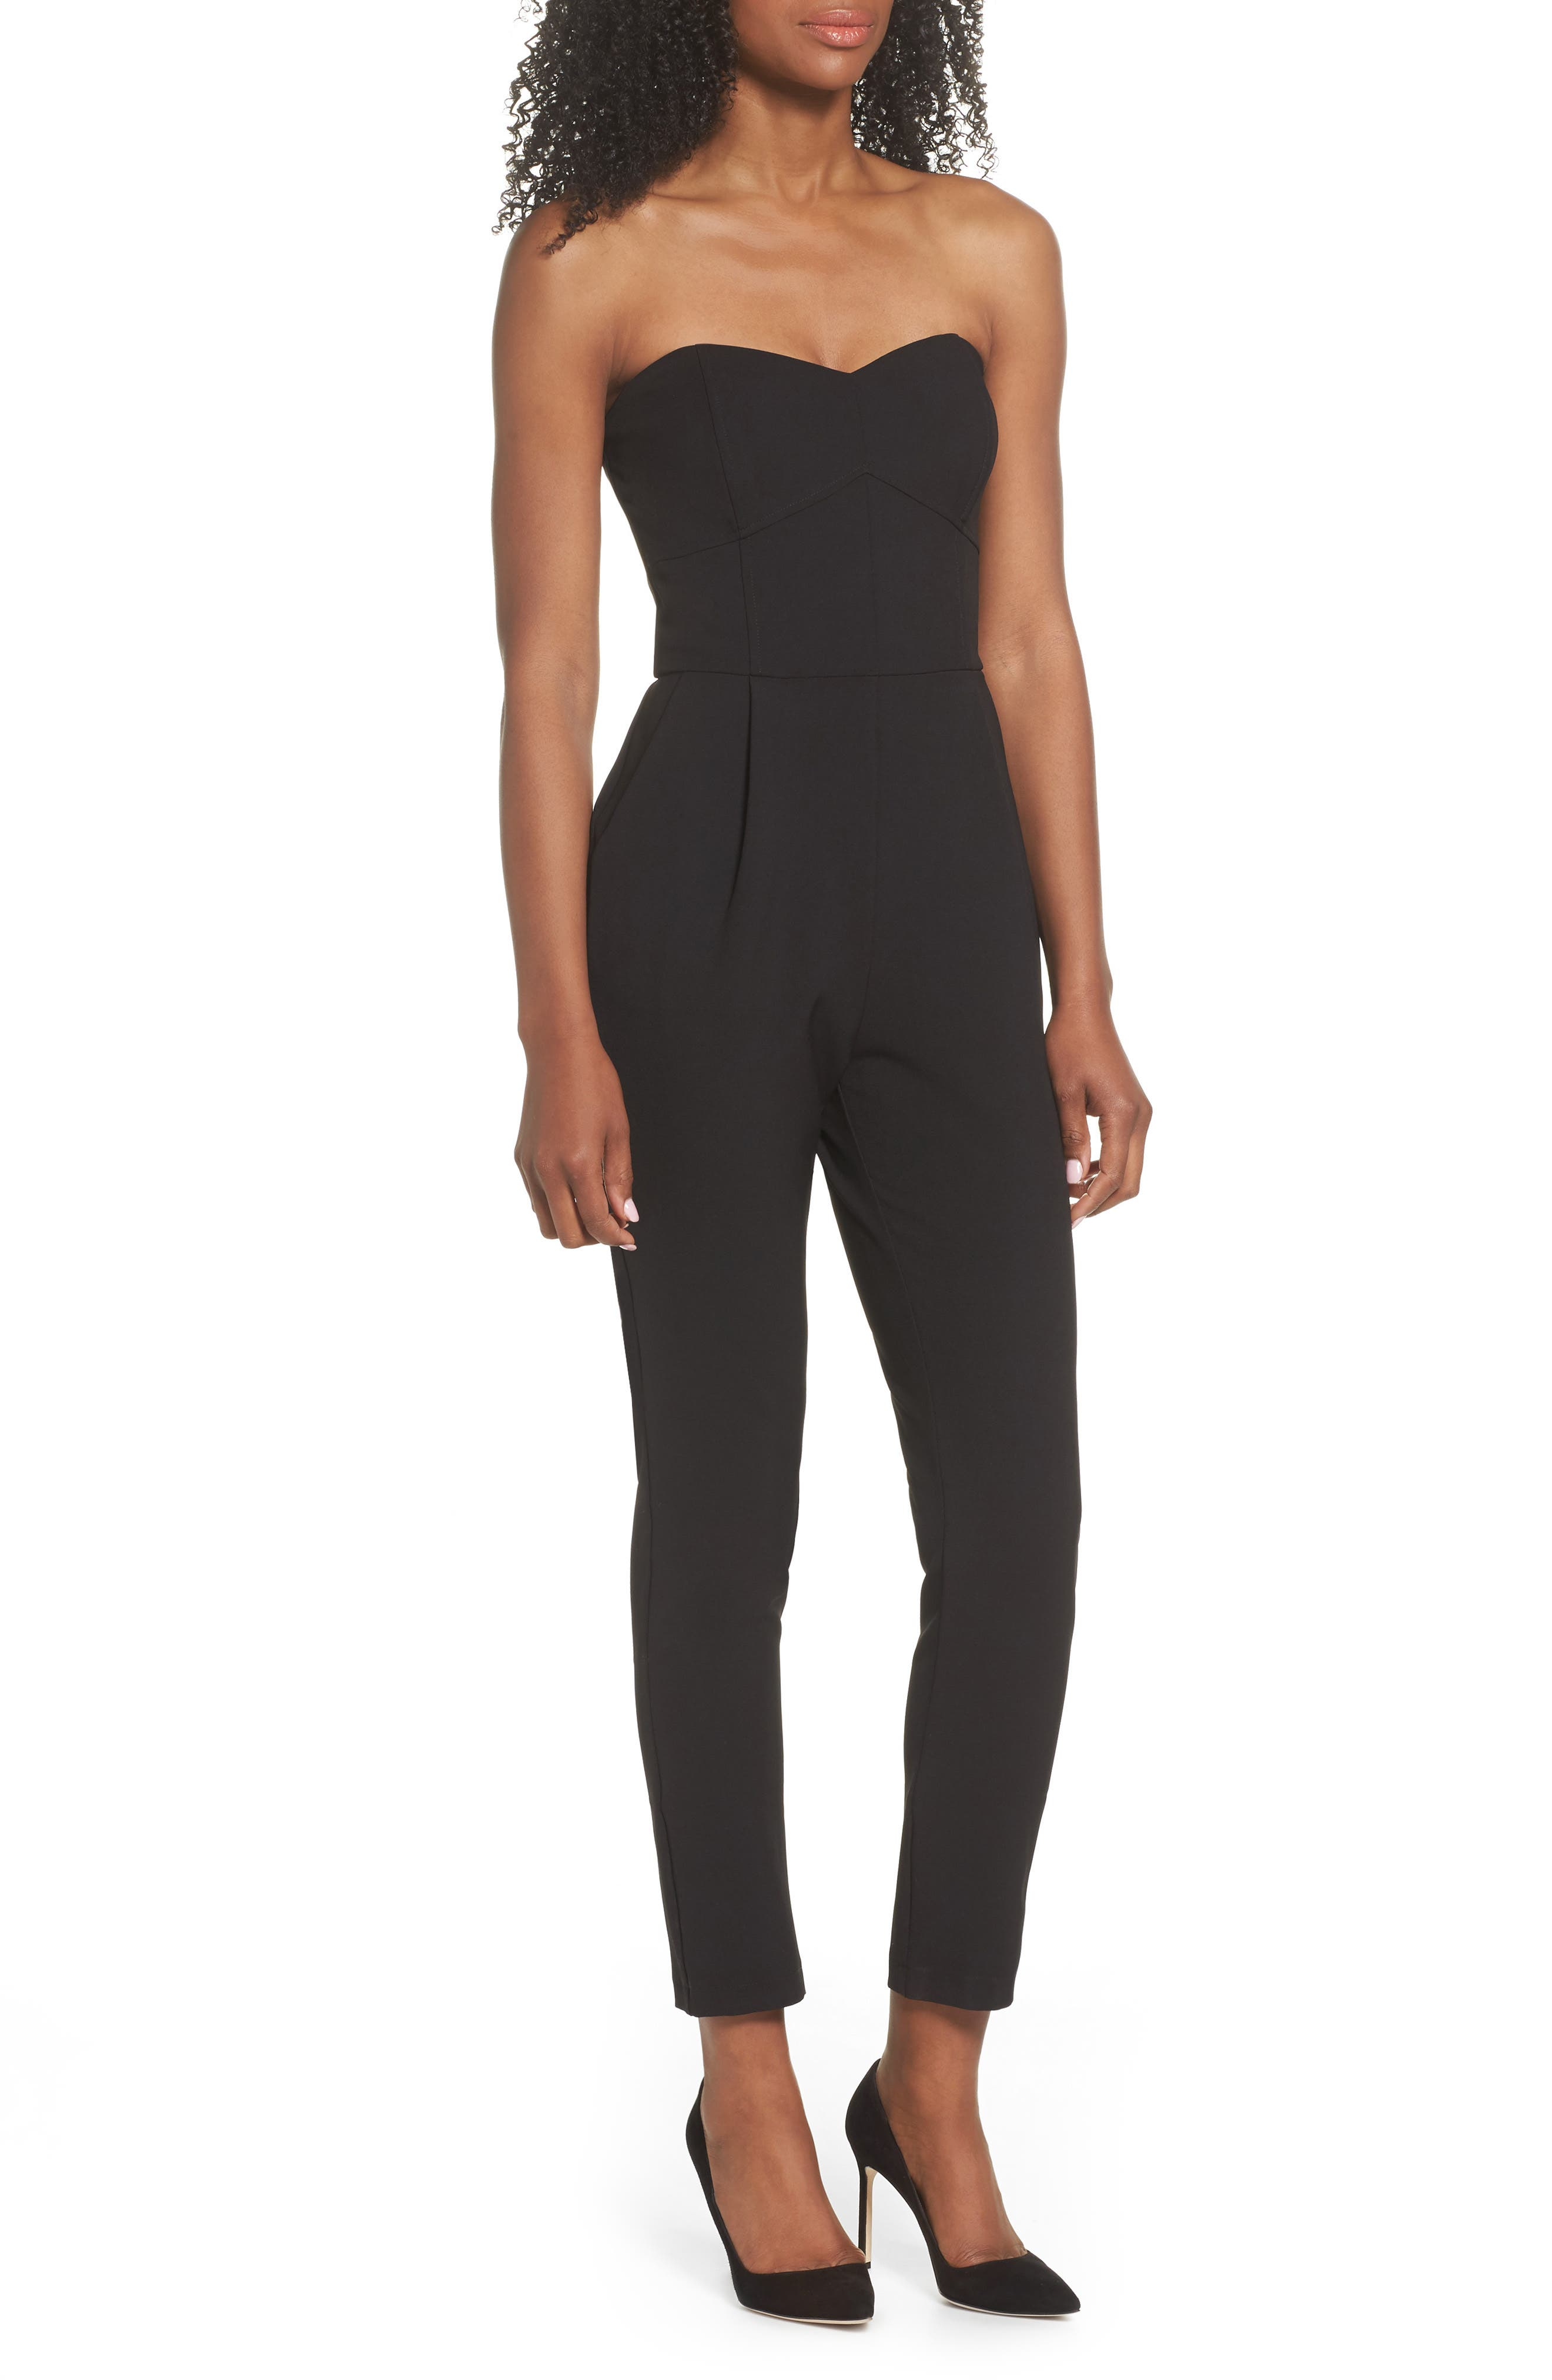 ADELYN RAE Strapless Slim Leg Jumpsuit, Main, color, 001